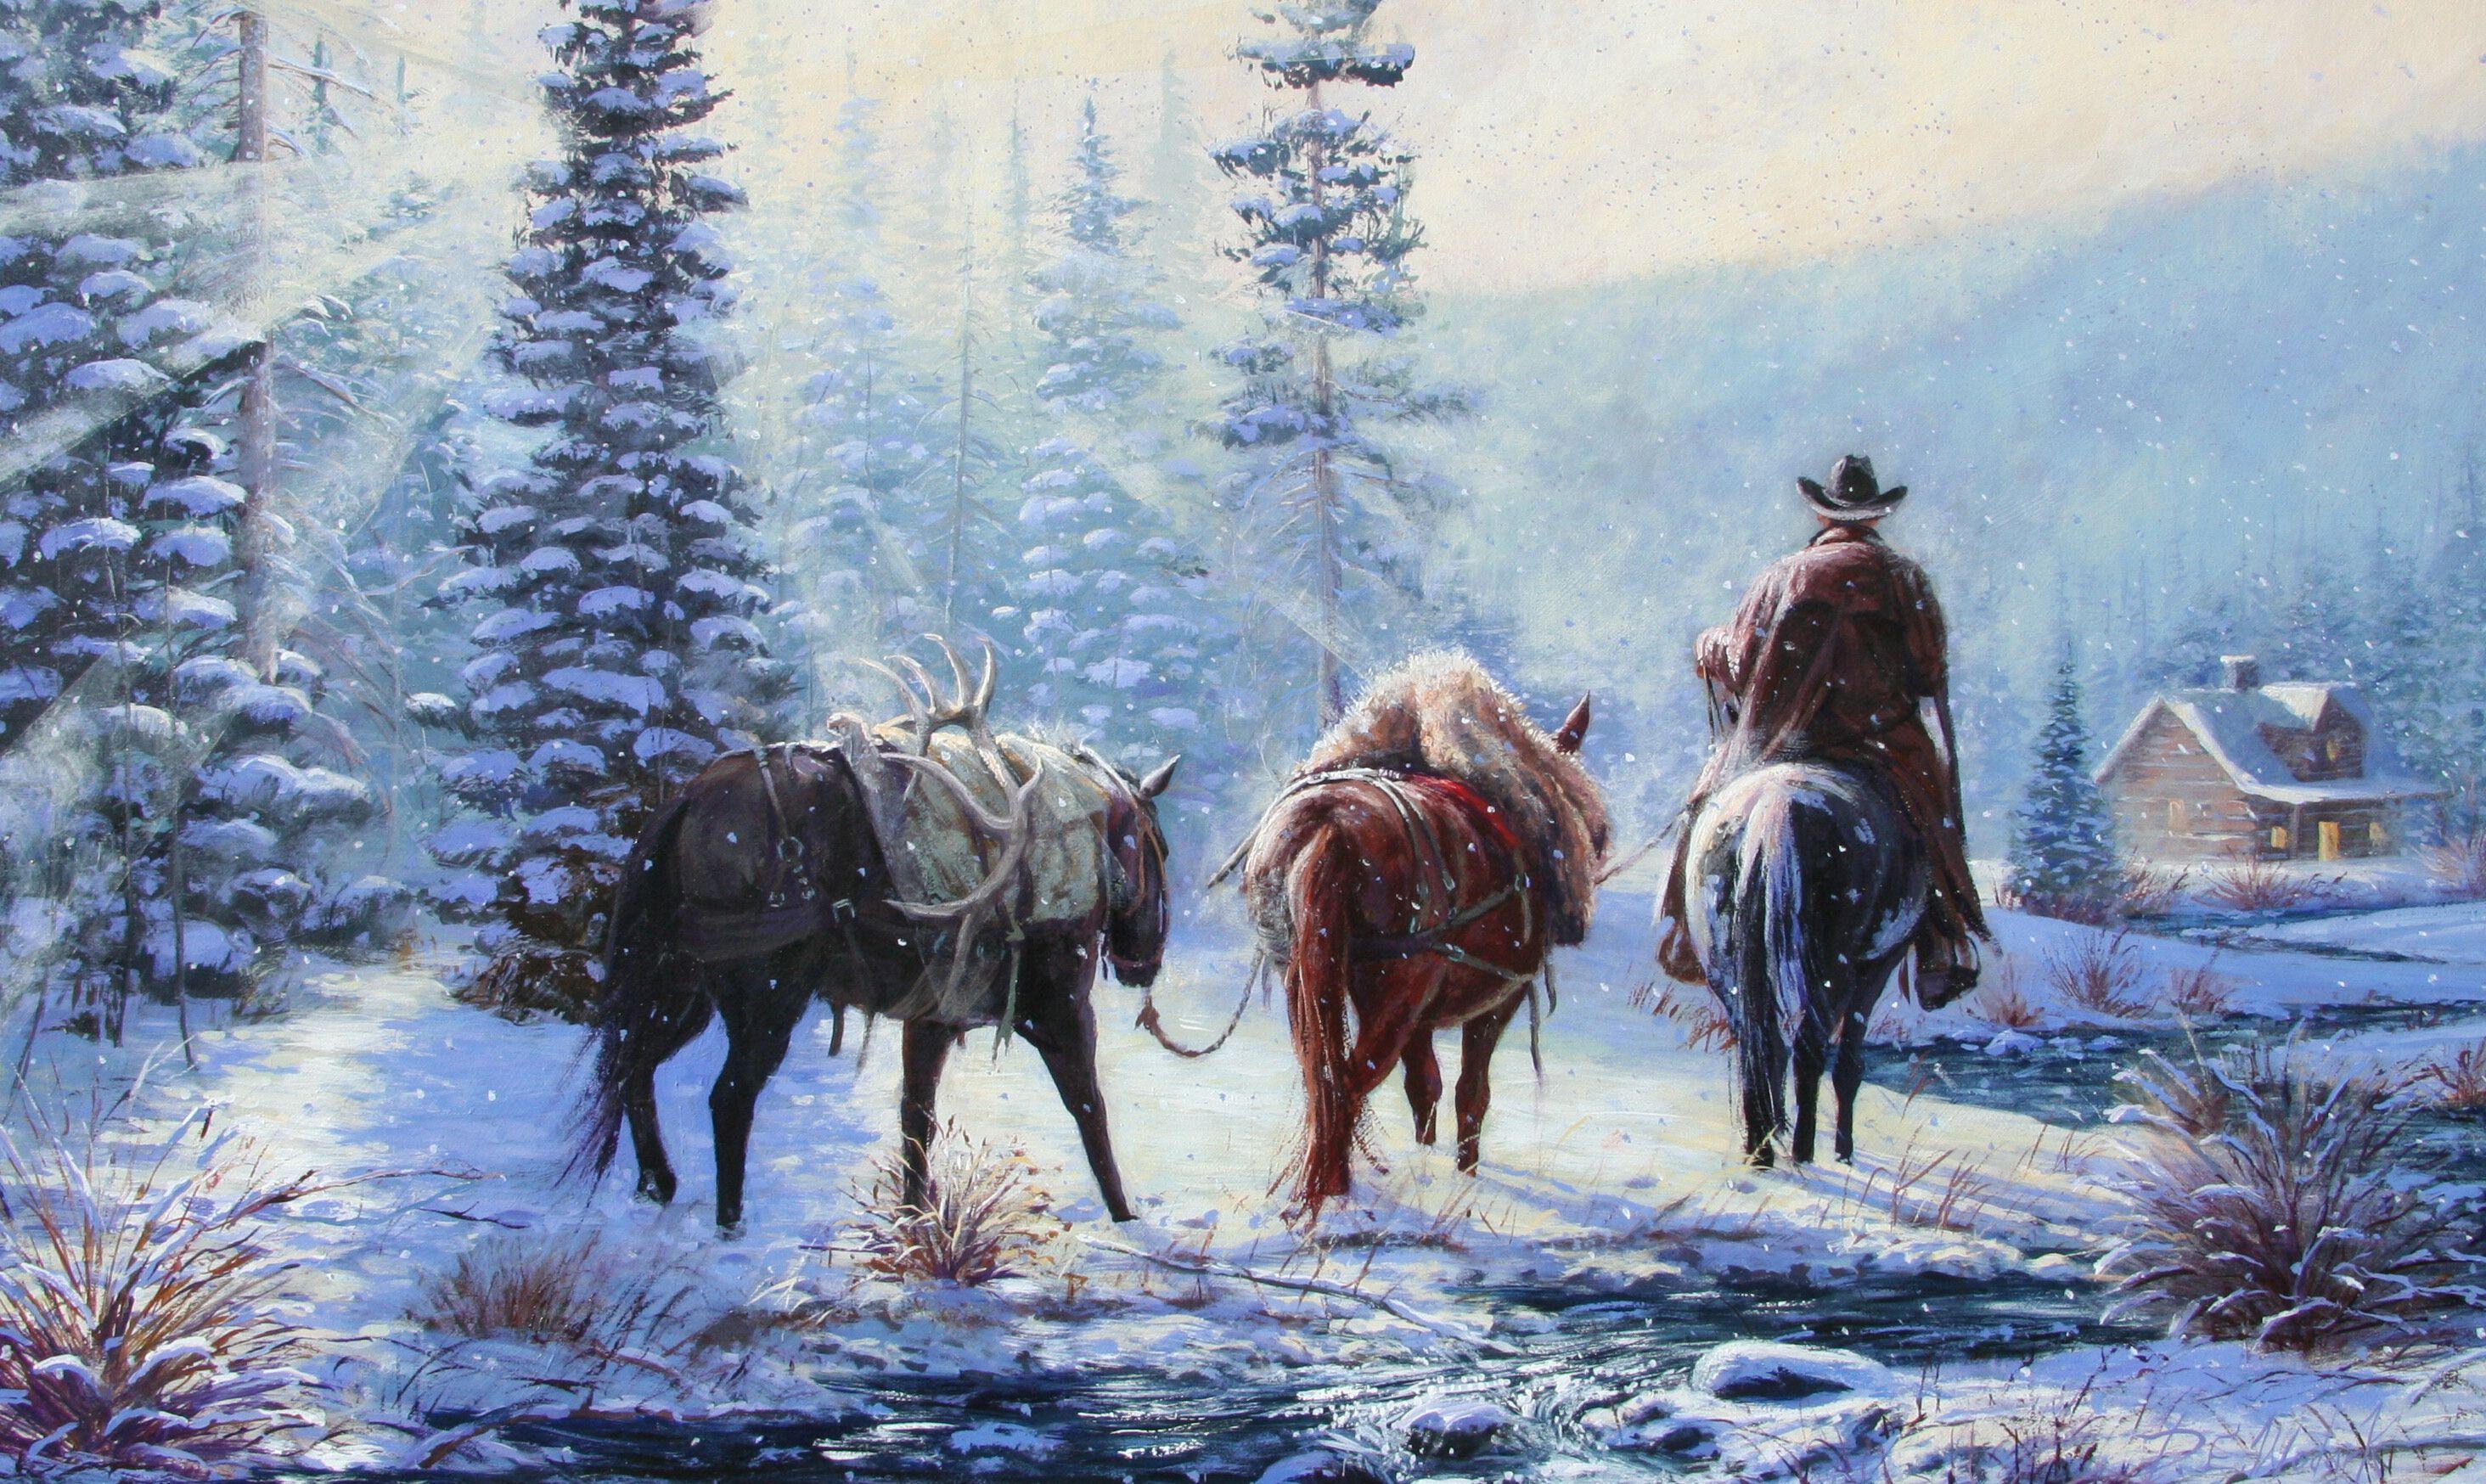 Western Christmas Background Wallpaper Cowboy Christmas Western Christmas Christmas Wallpaper Backgrounds